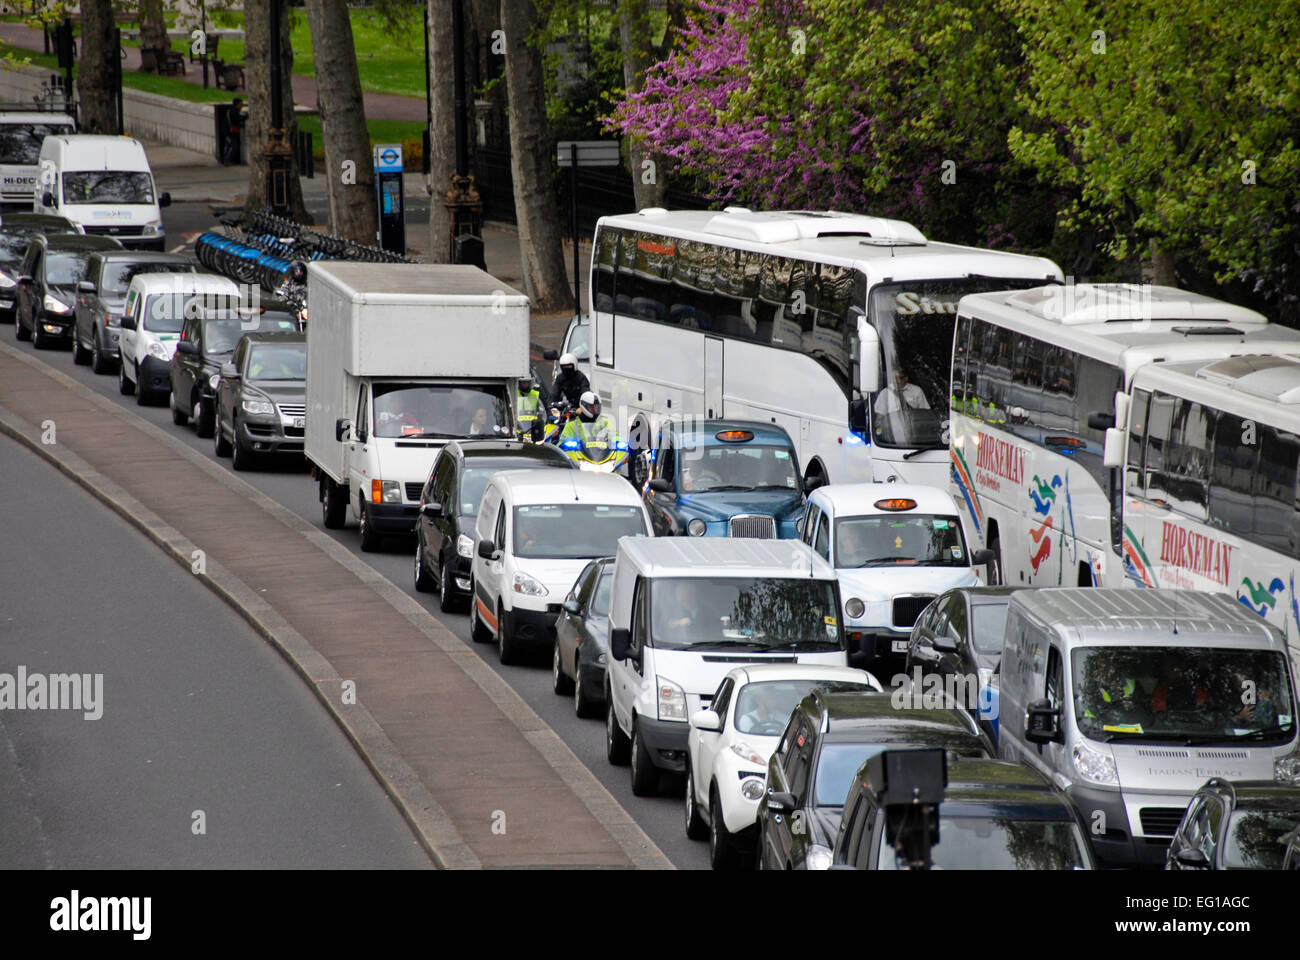 Traffic congestion on Thames Embankment, London, England Stock Photo